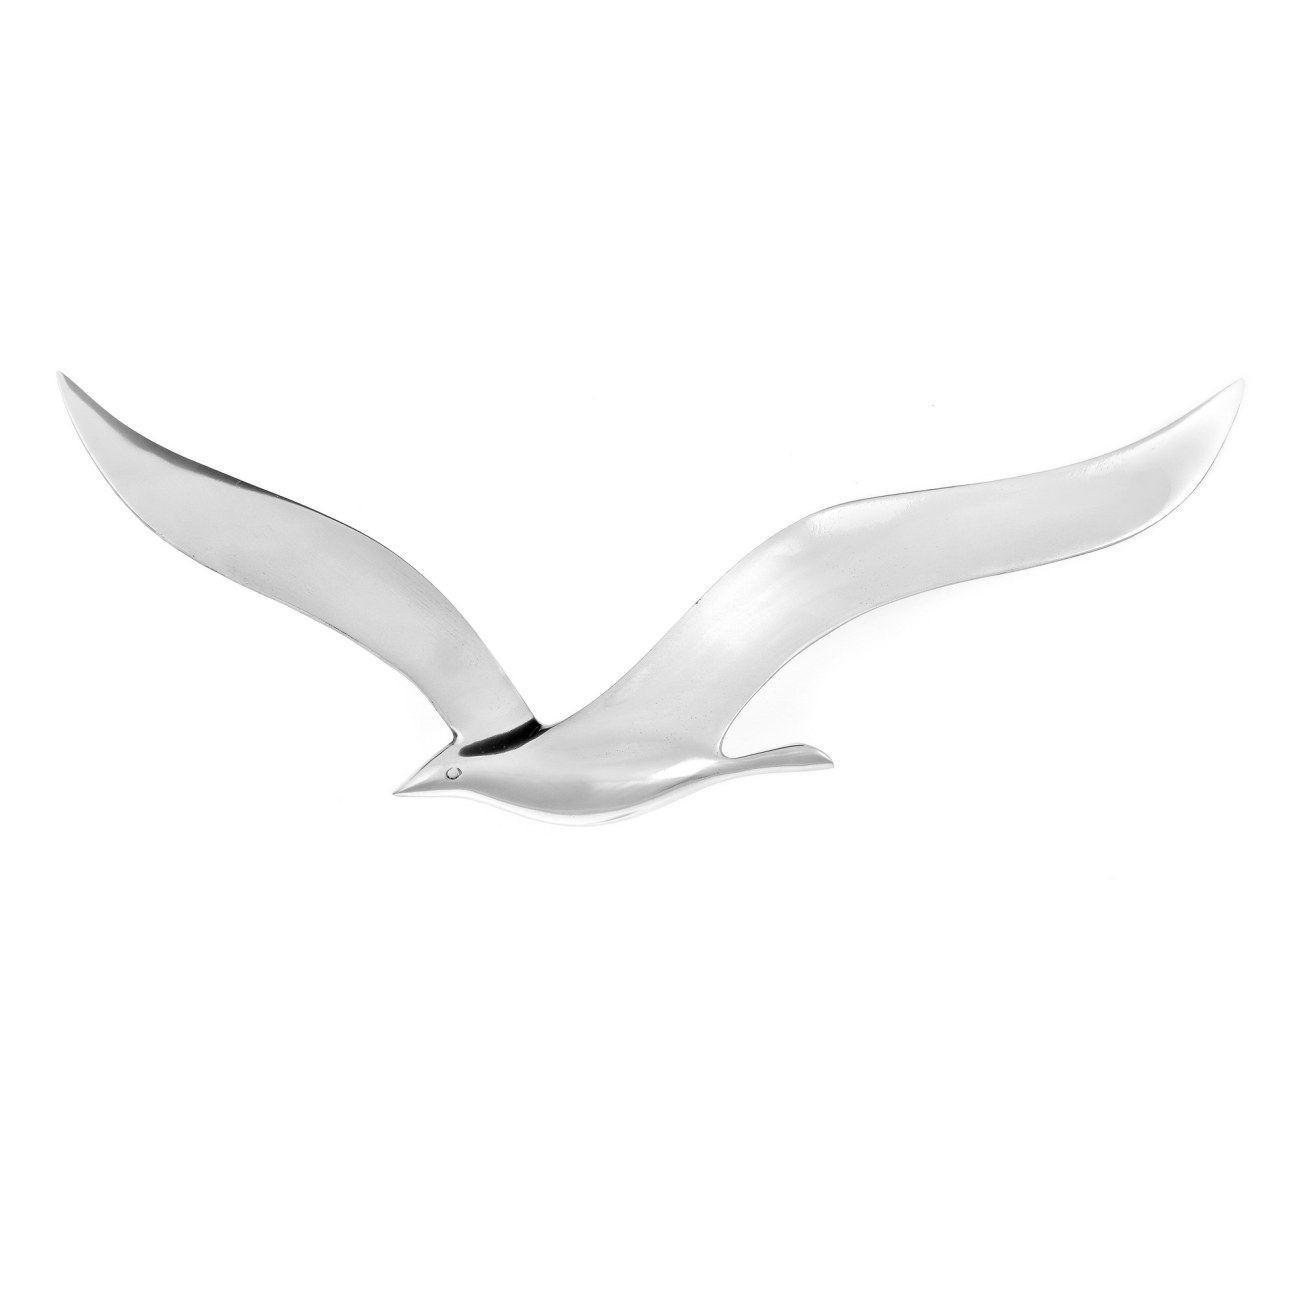 Metal Wall Art Decor Ornament, Handmade Seagull Bird Flying Figure In Metal Wall Art Flock Of Seagulls (View 19 of 20)